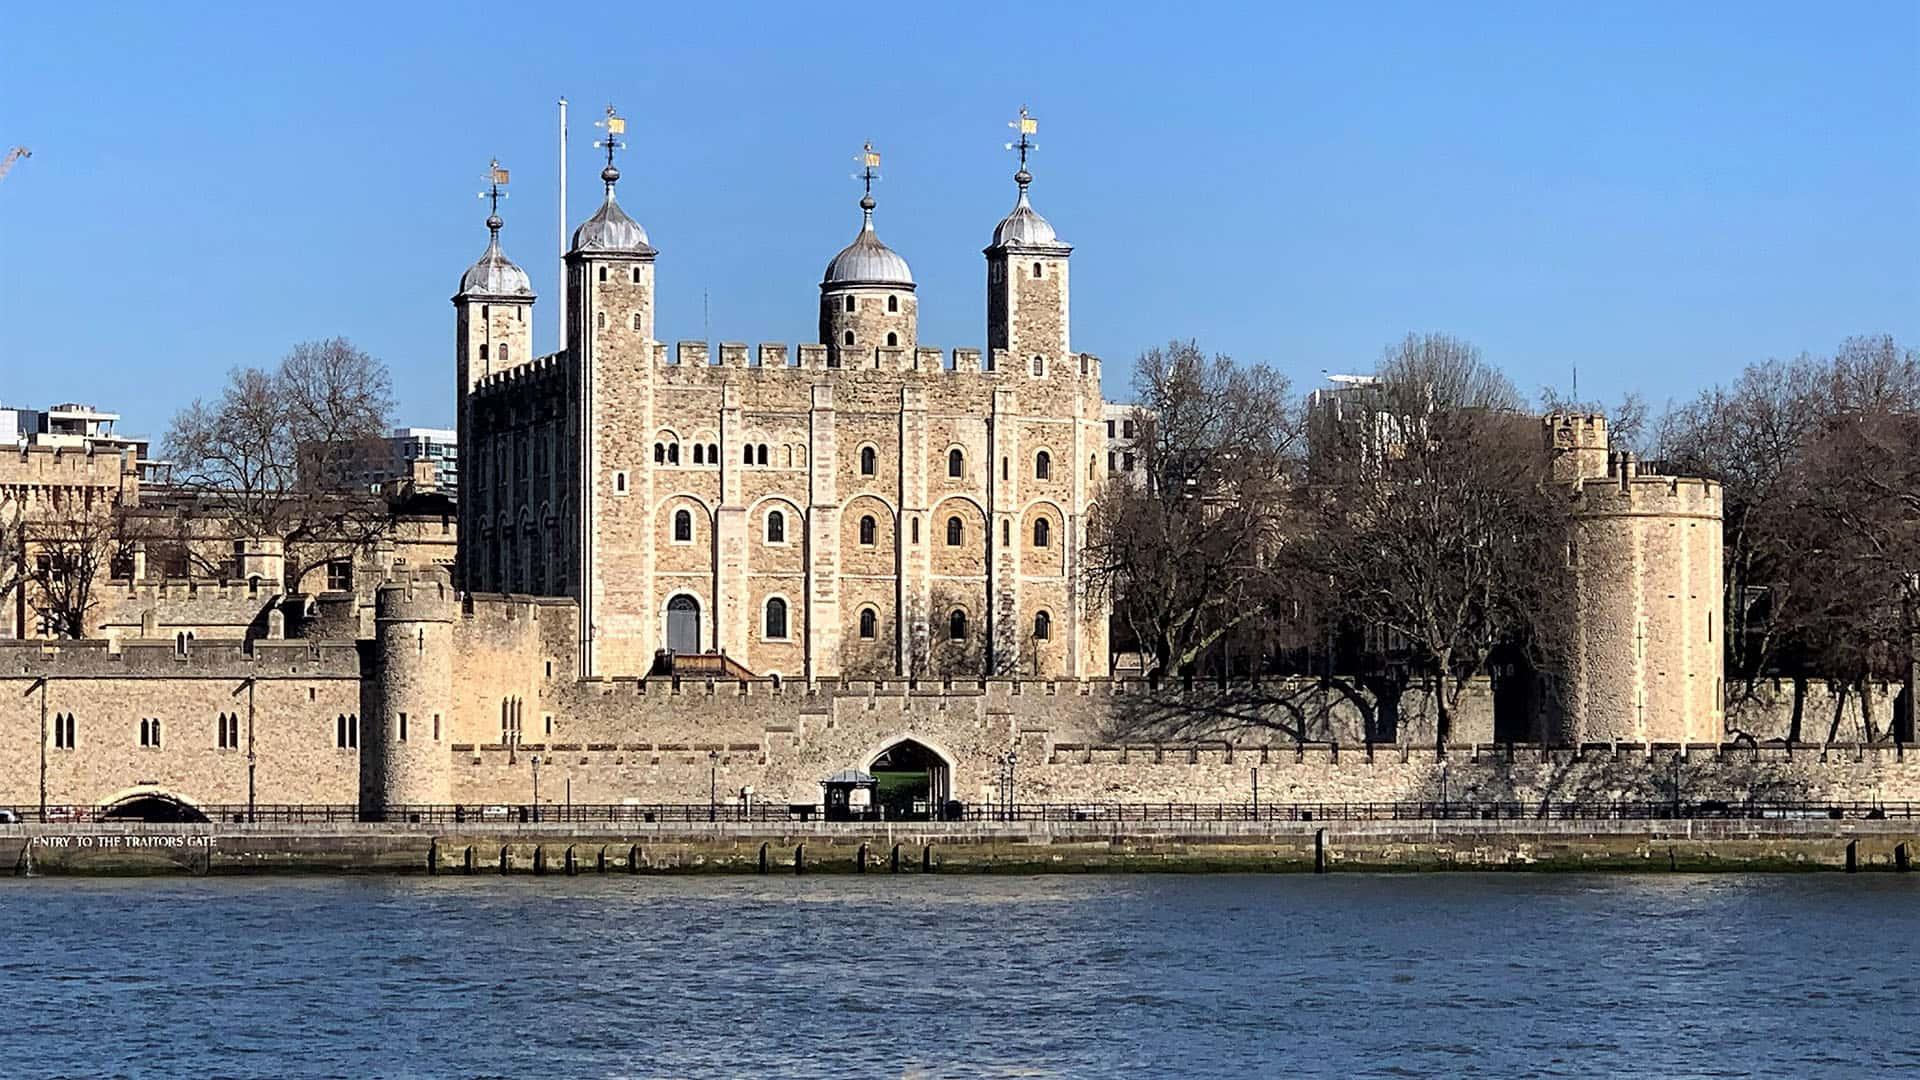 The Tower of London, London Virtual Tour